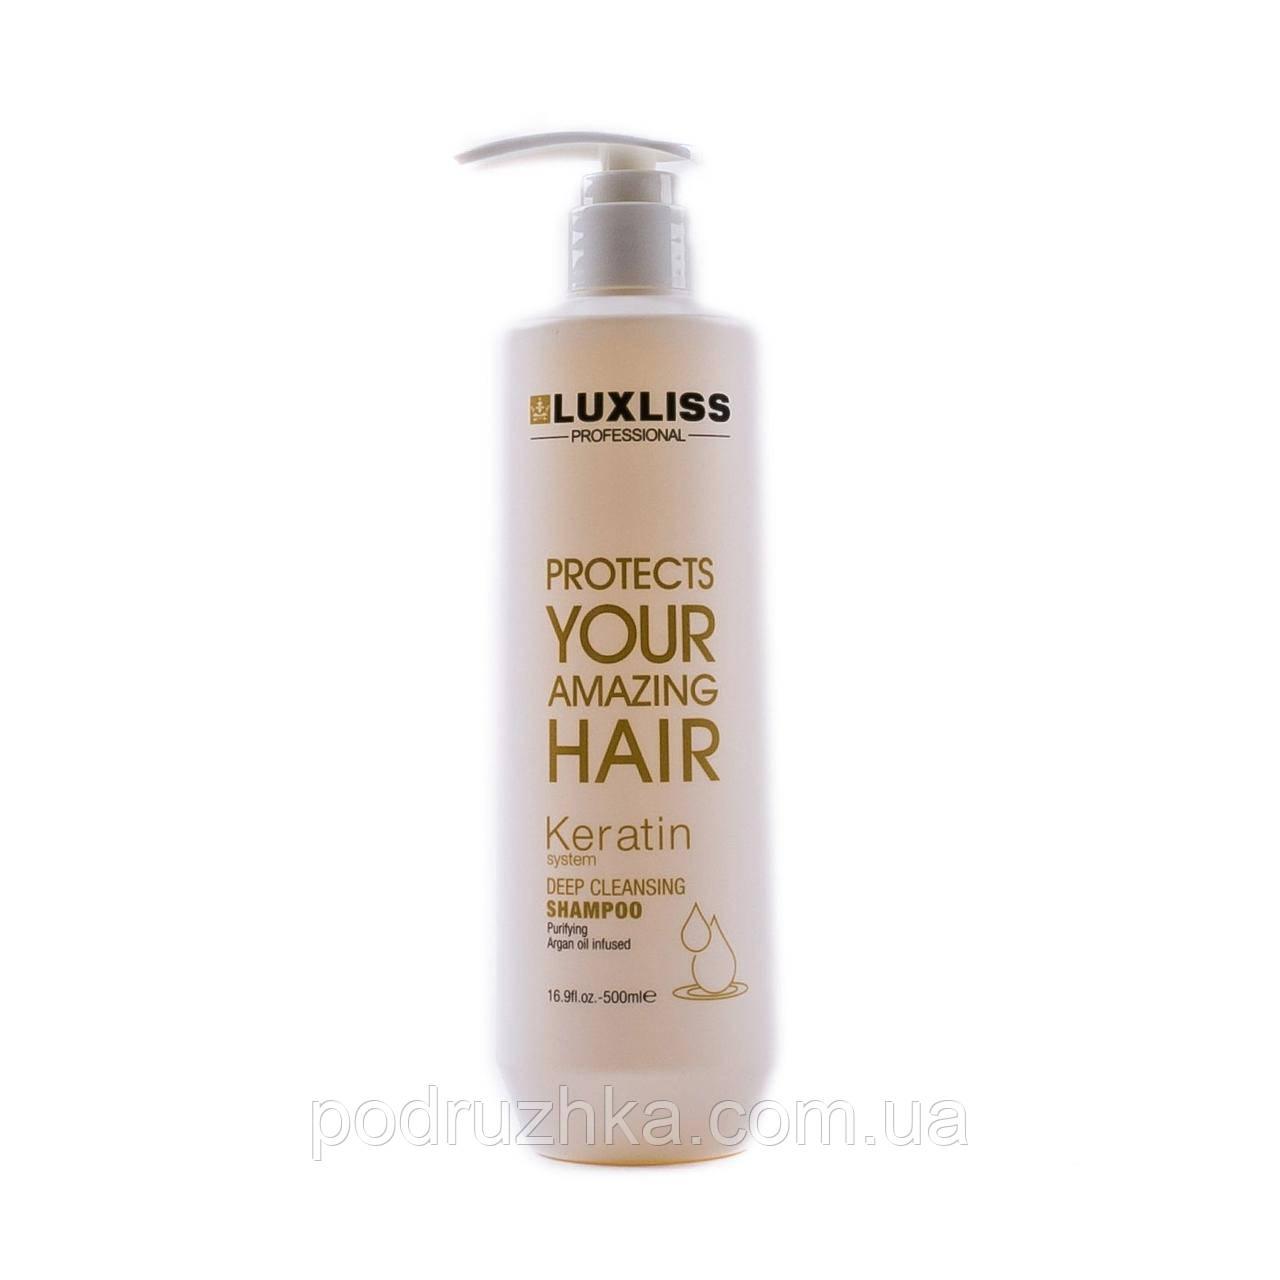 Luxliss Keratin Deep Cleaning Shampoo Шампунь для глибокого очищення, 500 мл